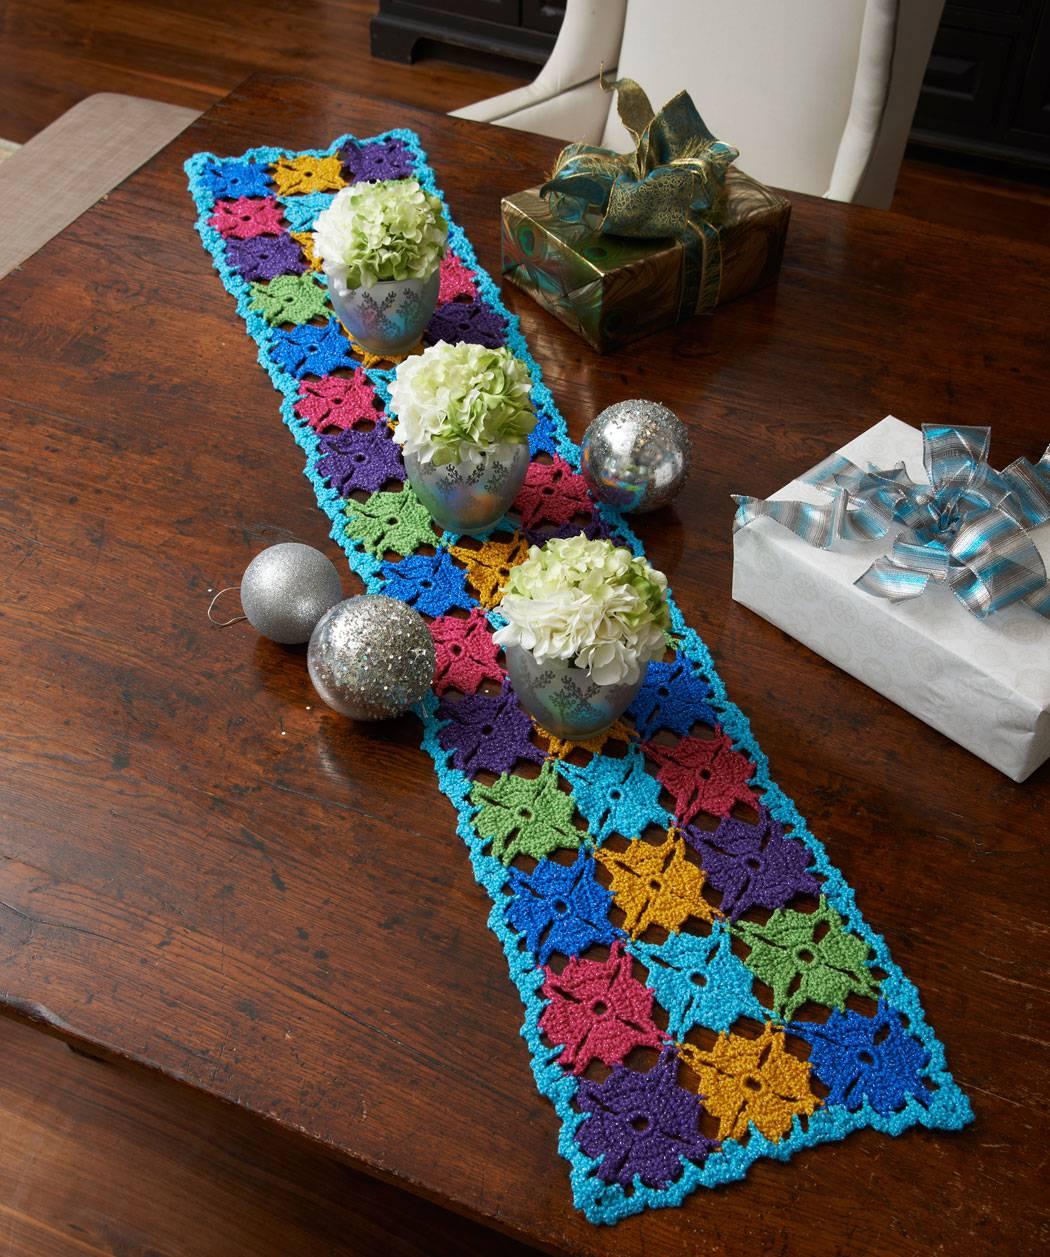 caminho de mesa de croche azul comprido